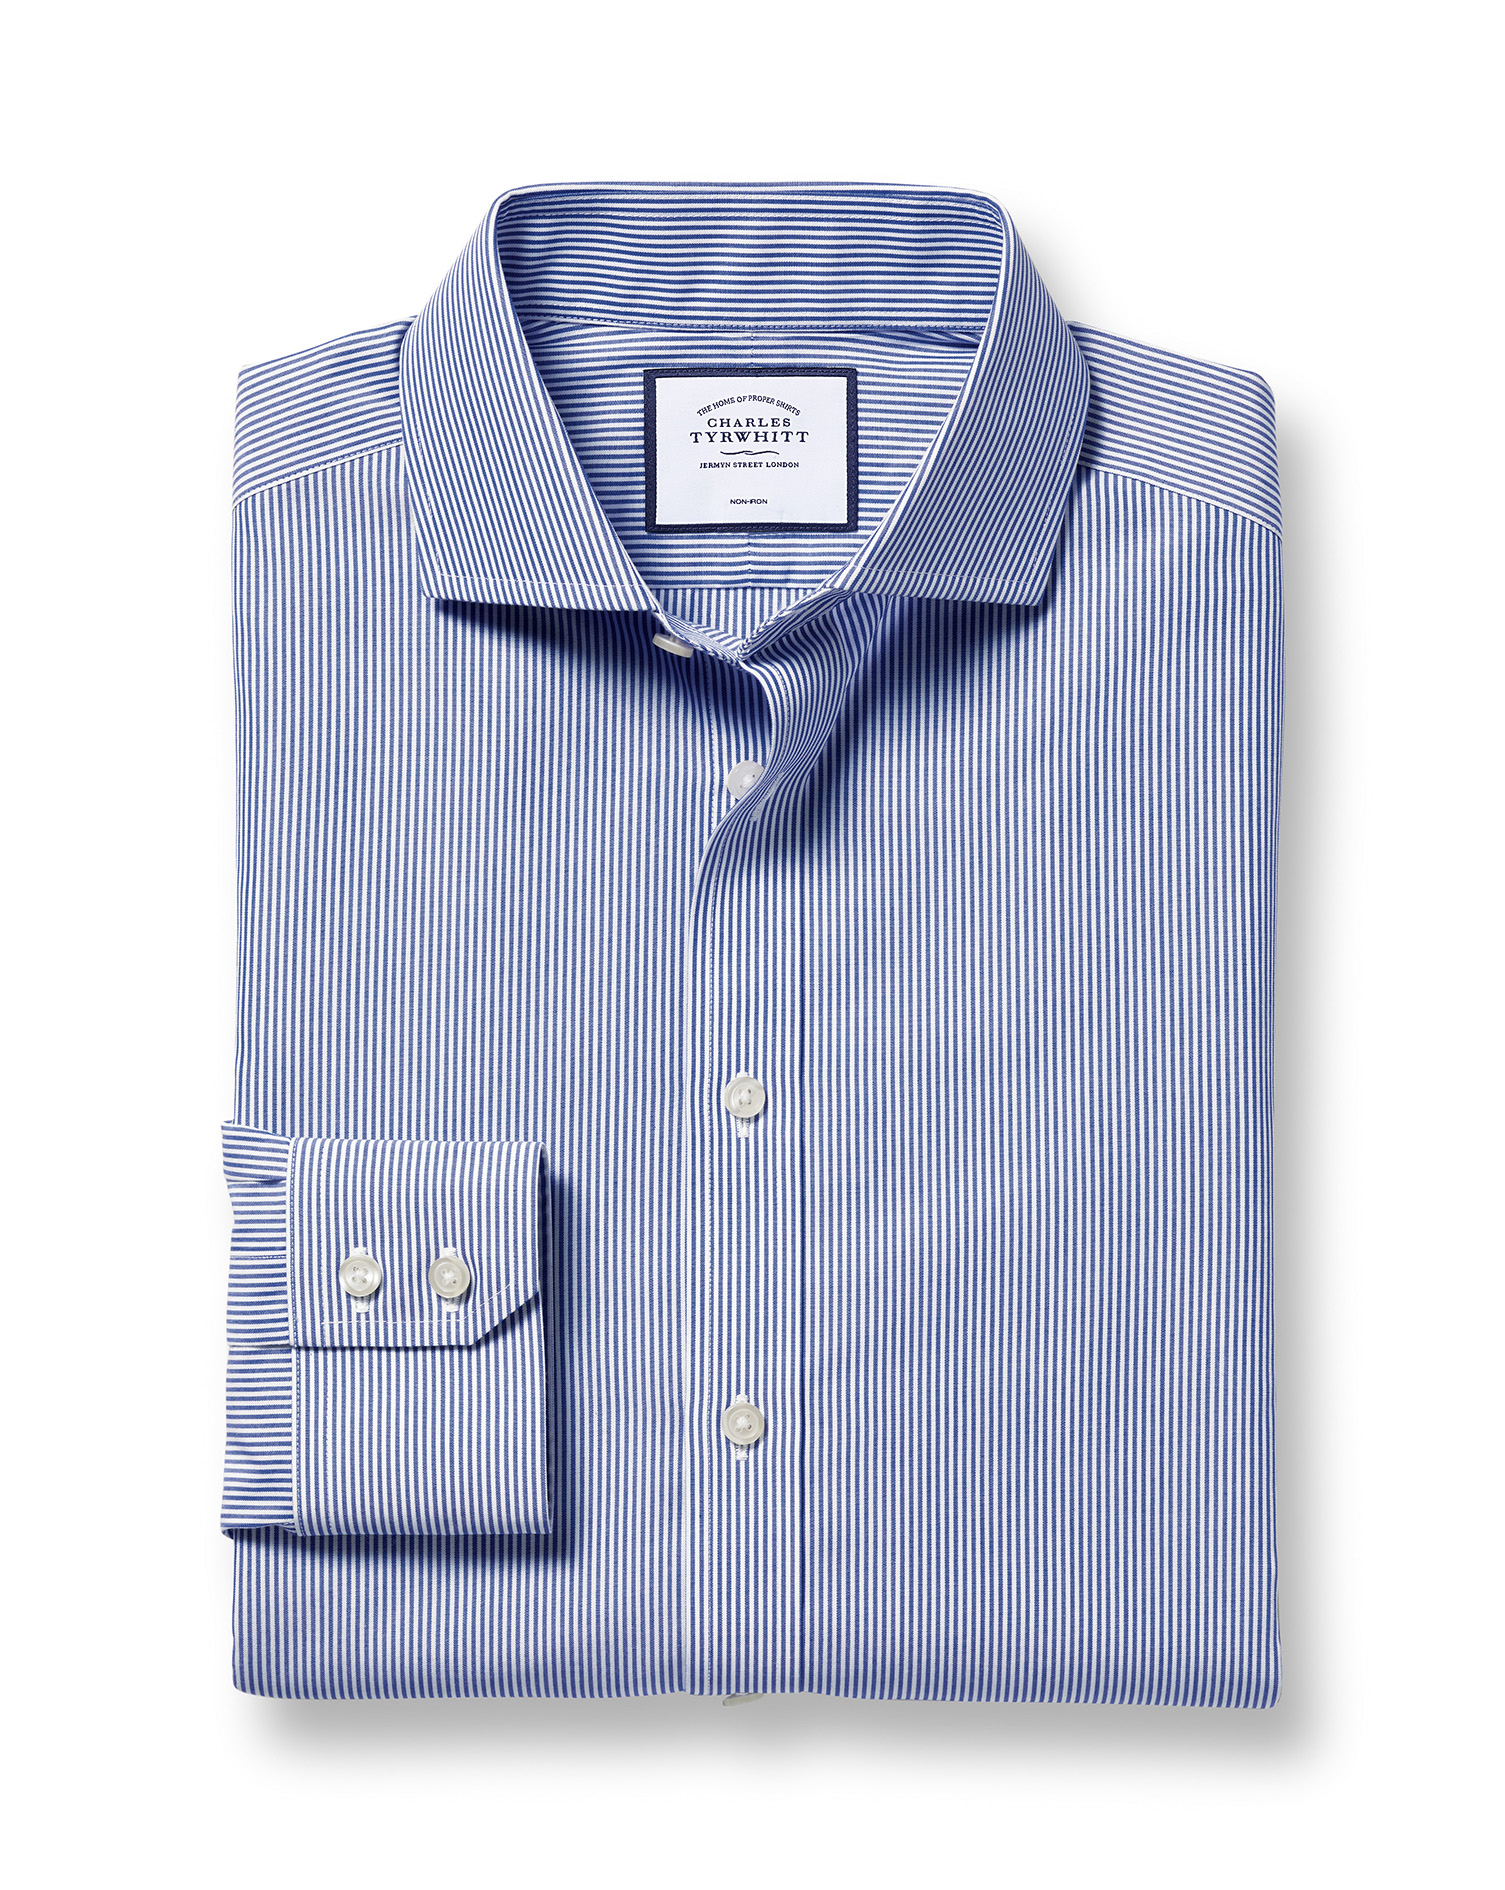 Extra Slim Fit Cutaway Non-Iron Bengal Stripe Navy Blue Cotton Formal Shirt Single Cuff Size 16/38 b